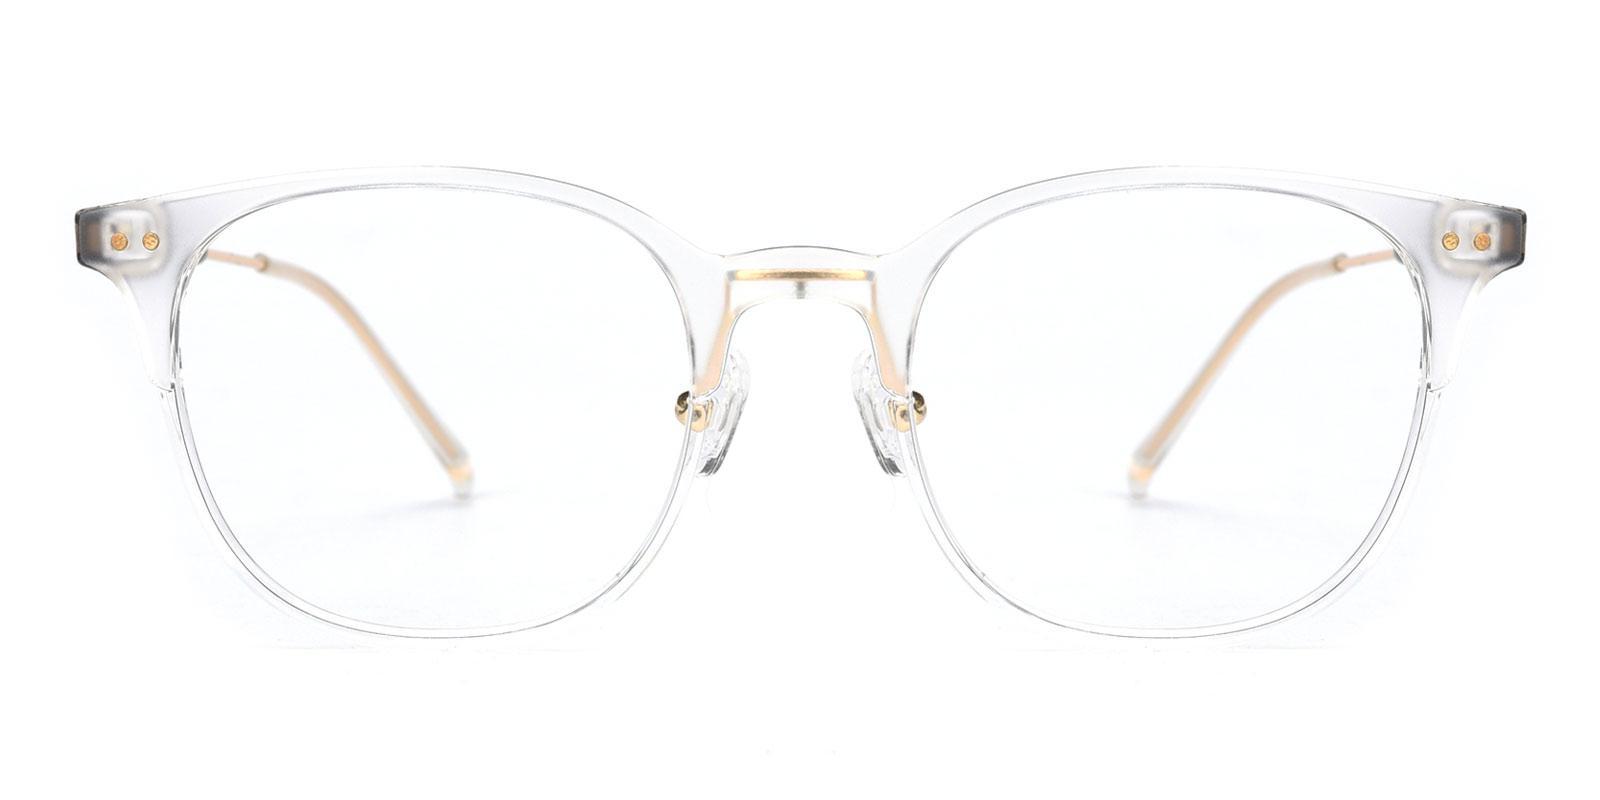 Guide-Translucent-Rectangle-TR-Eyeglasses-detail